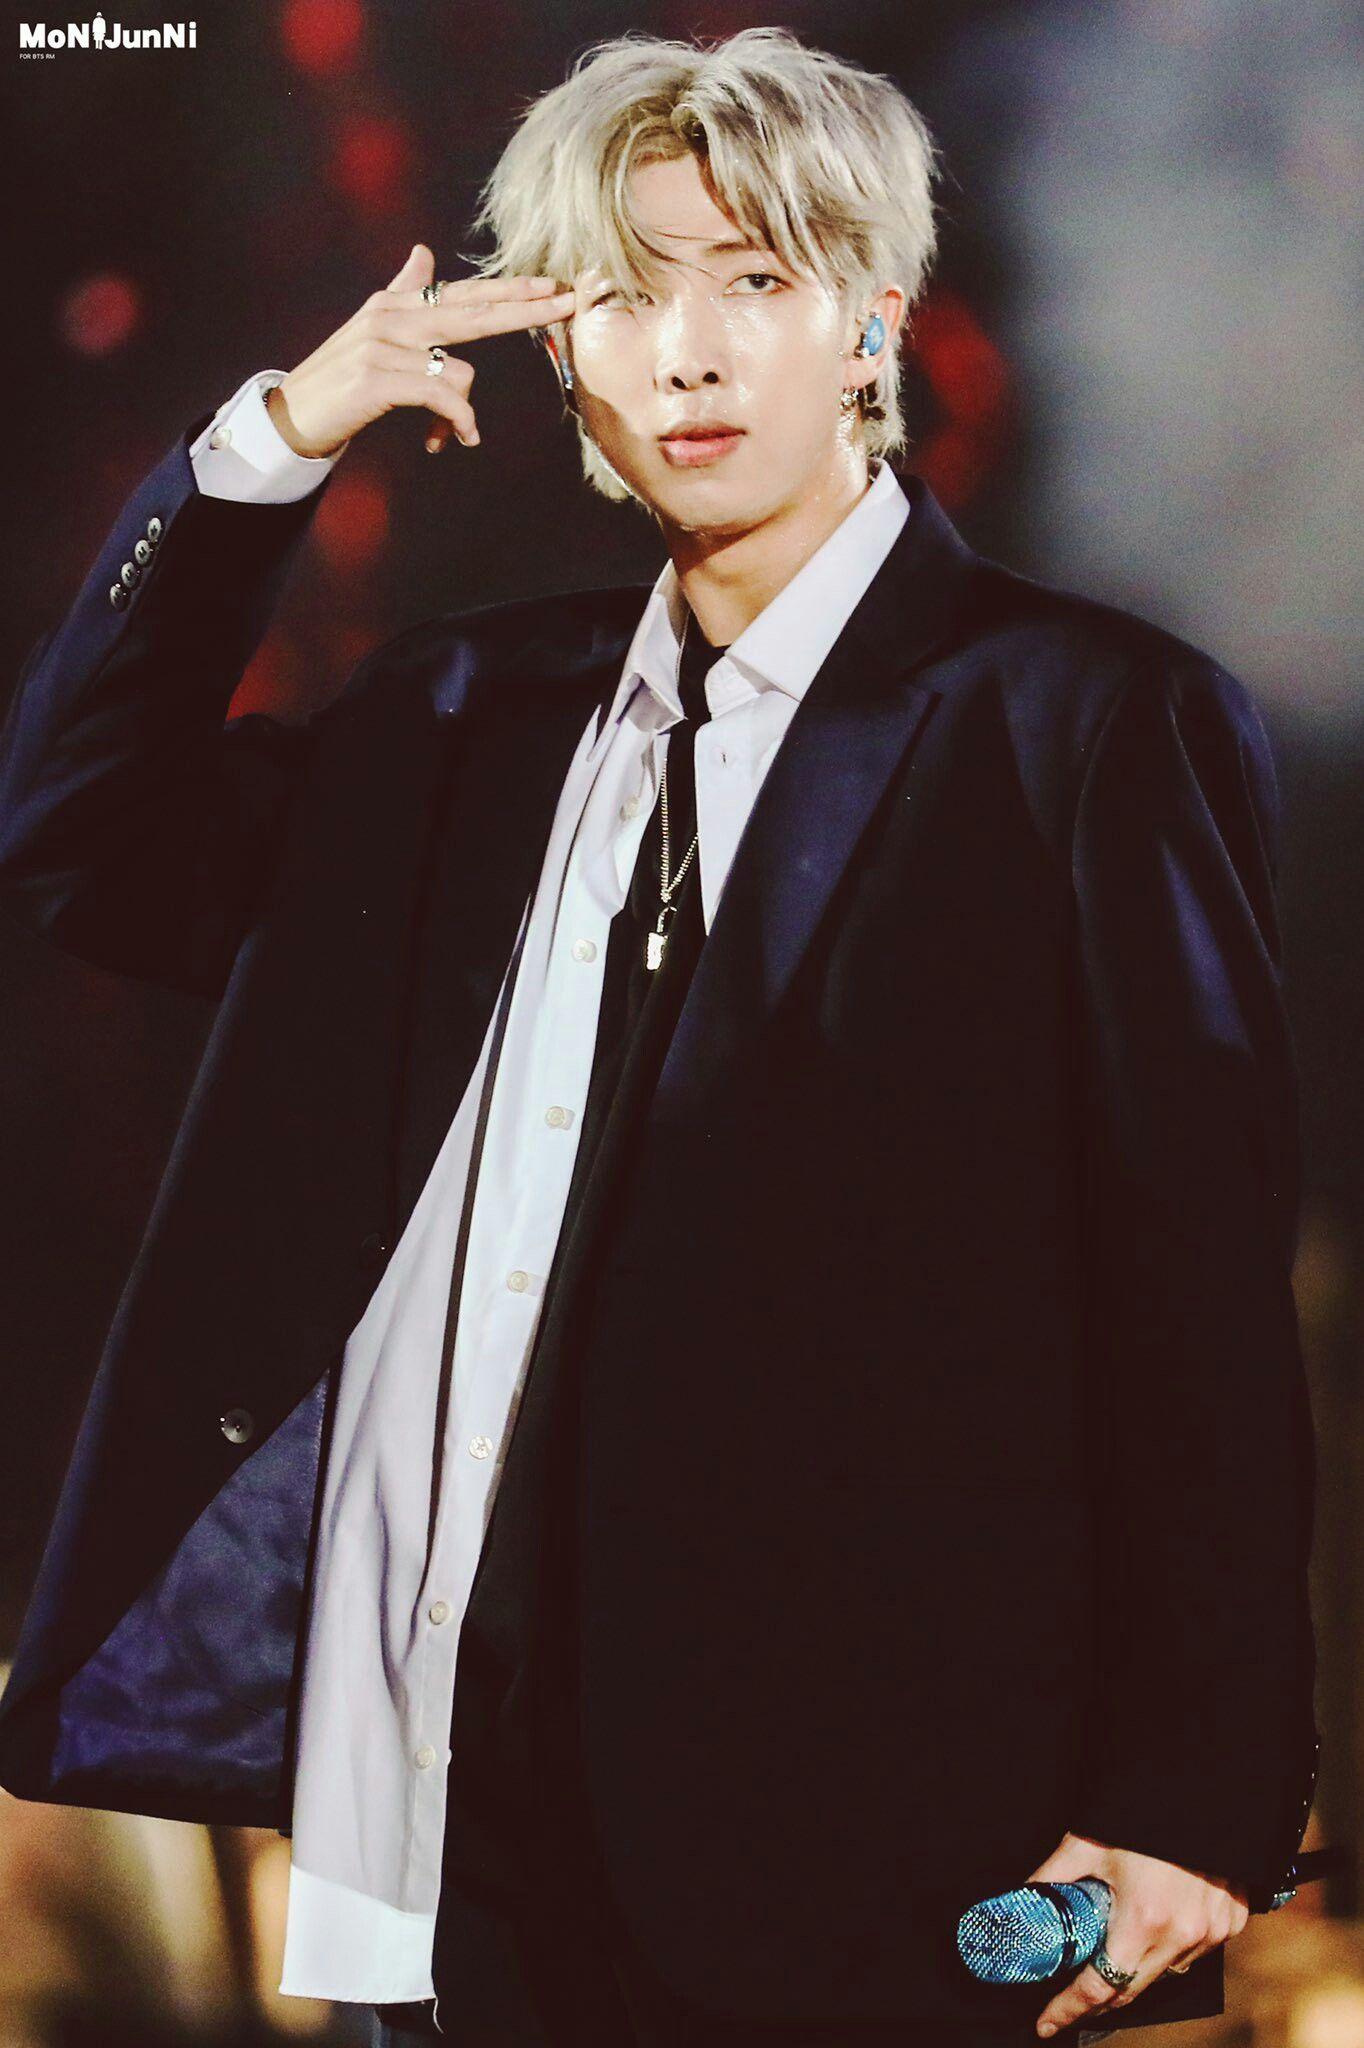 Namjoon With Long Hair Hits Different Namjoon Kim Namjoon Bts Rap Monster